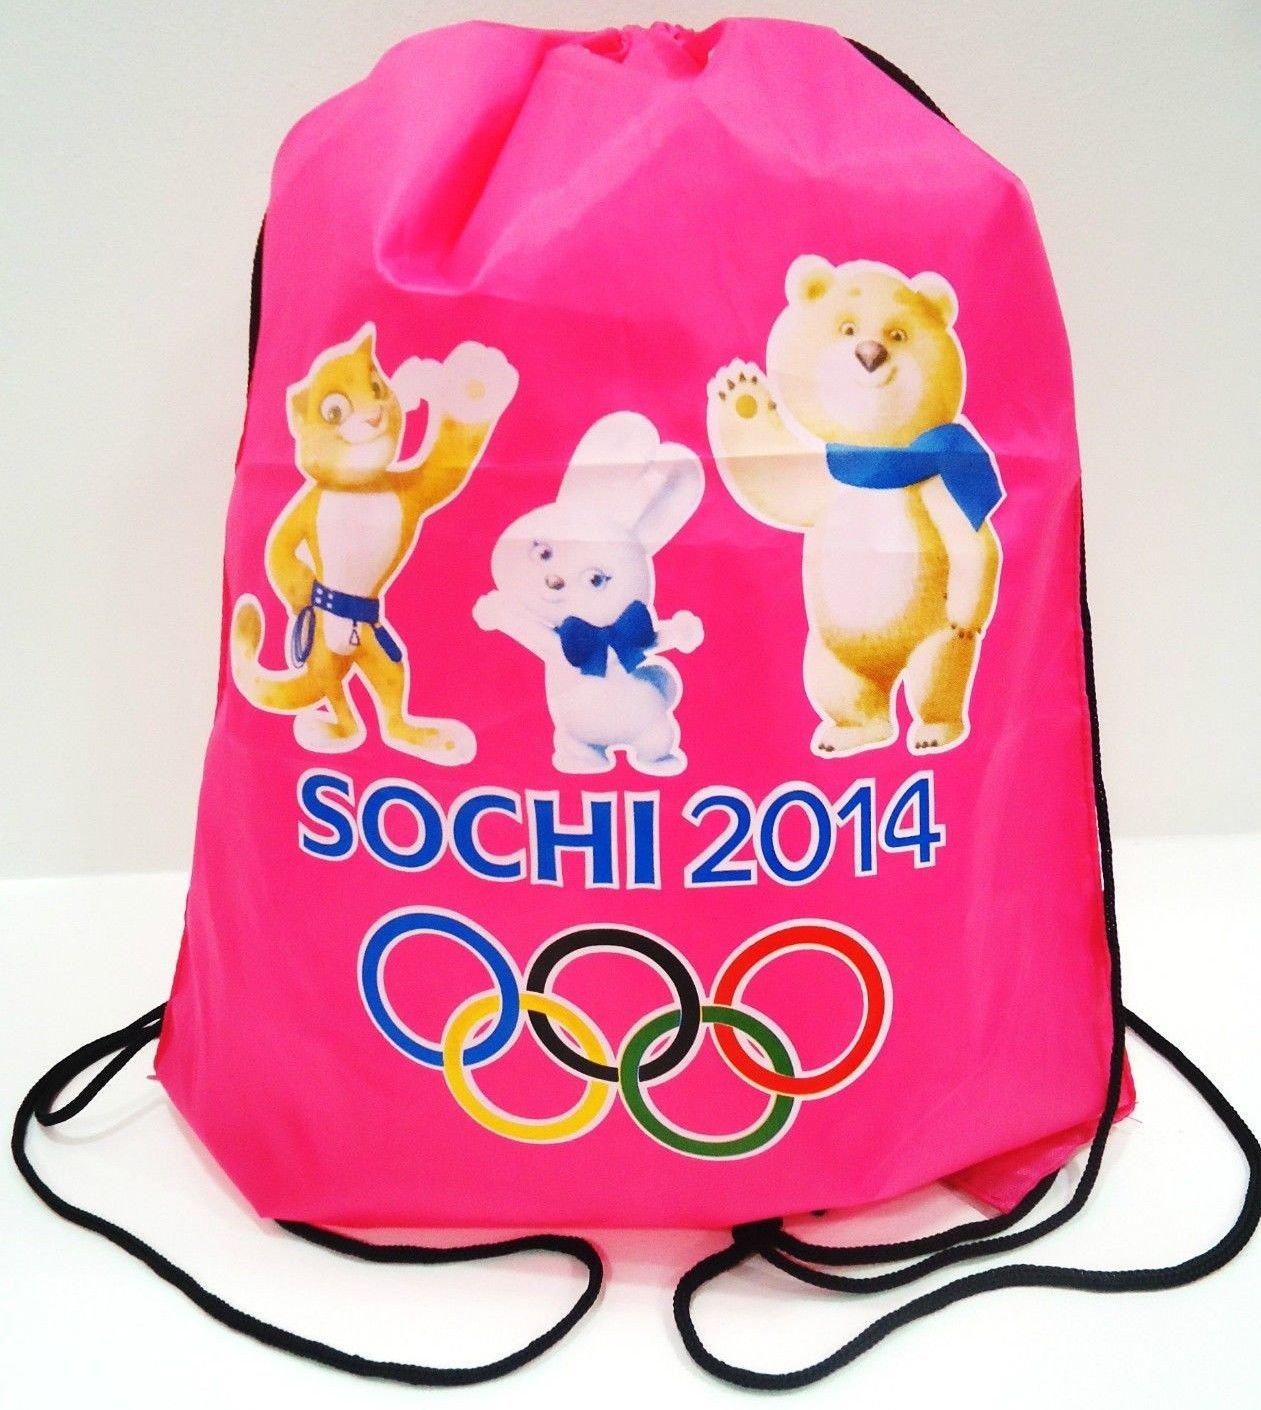 SOCHI - WINTER - OLYMPICS - PINK - MASCOT - BACKPACK - BRAND NEW - BAG - RUSSIA